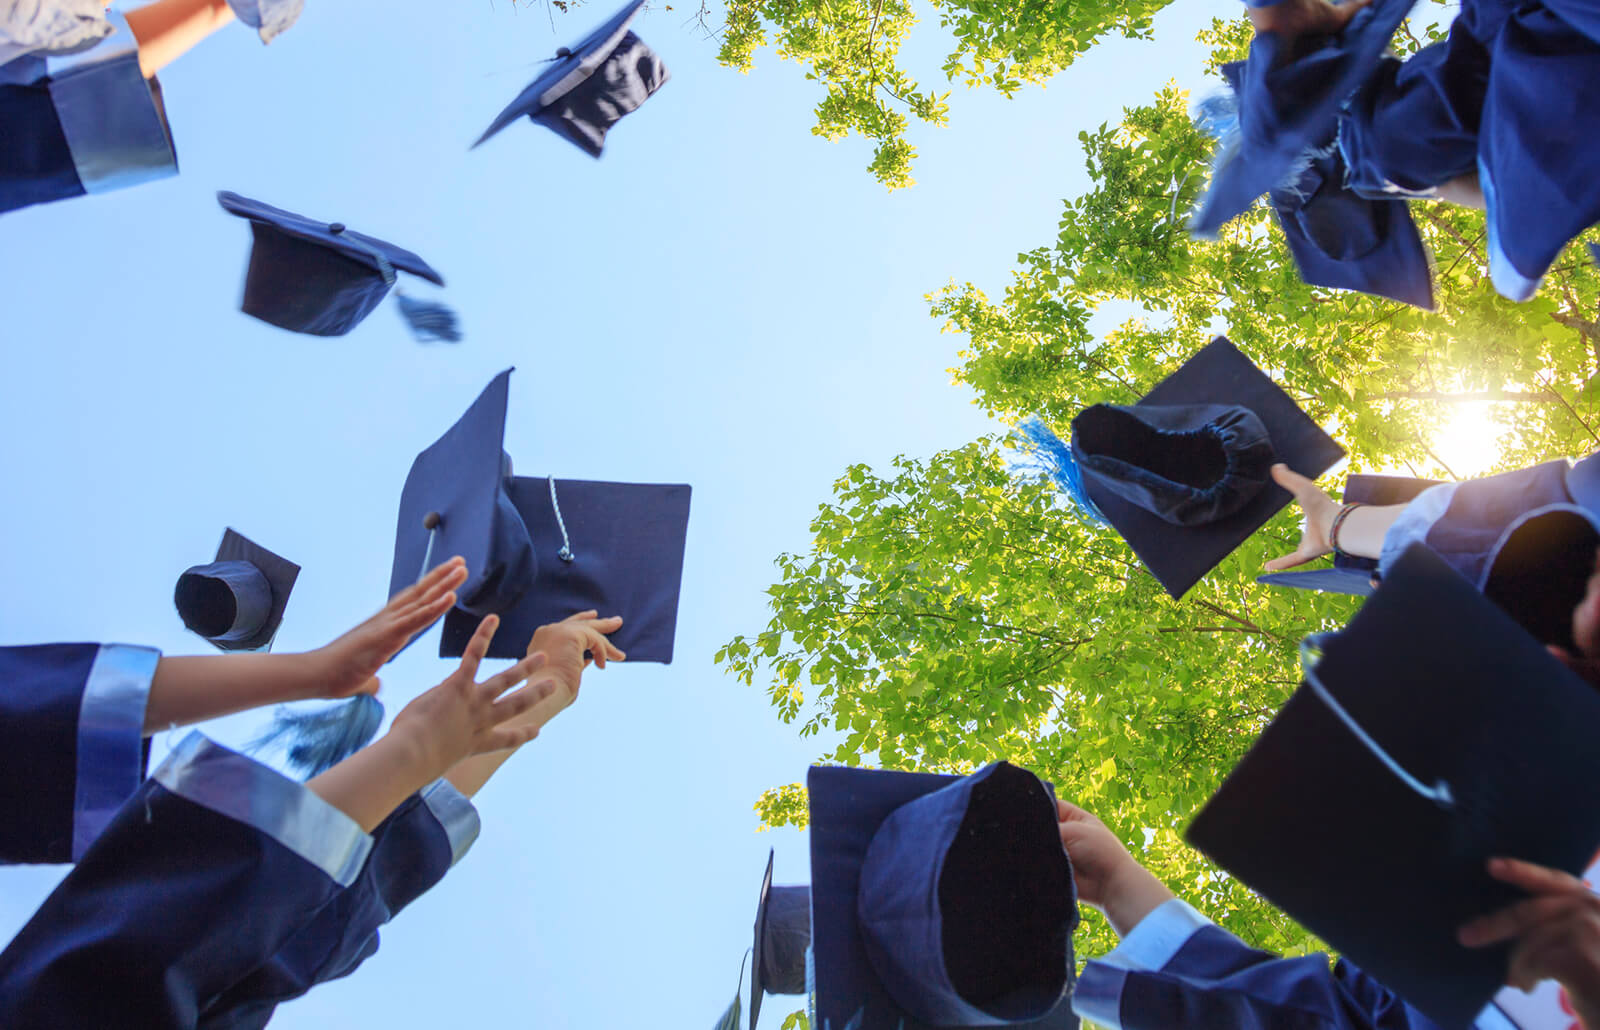 https://www.business-magazine.mu/wp-content/uploads/2020/11/graduation_20200819161539.jpg